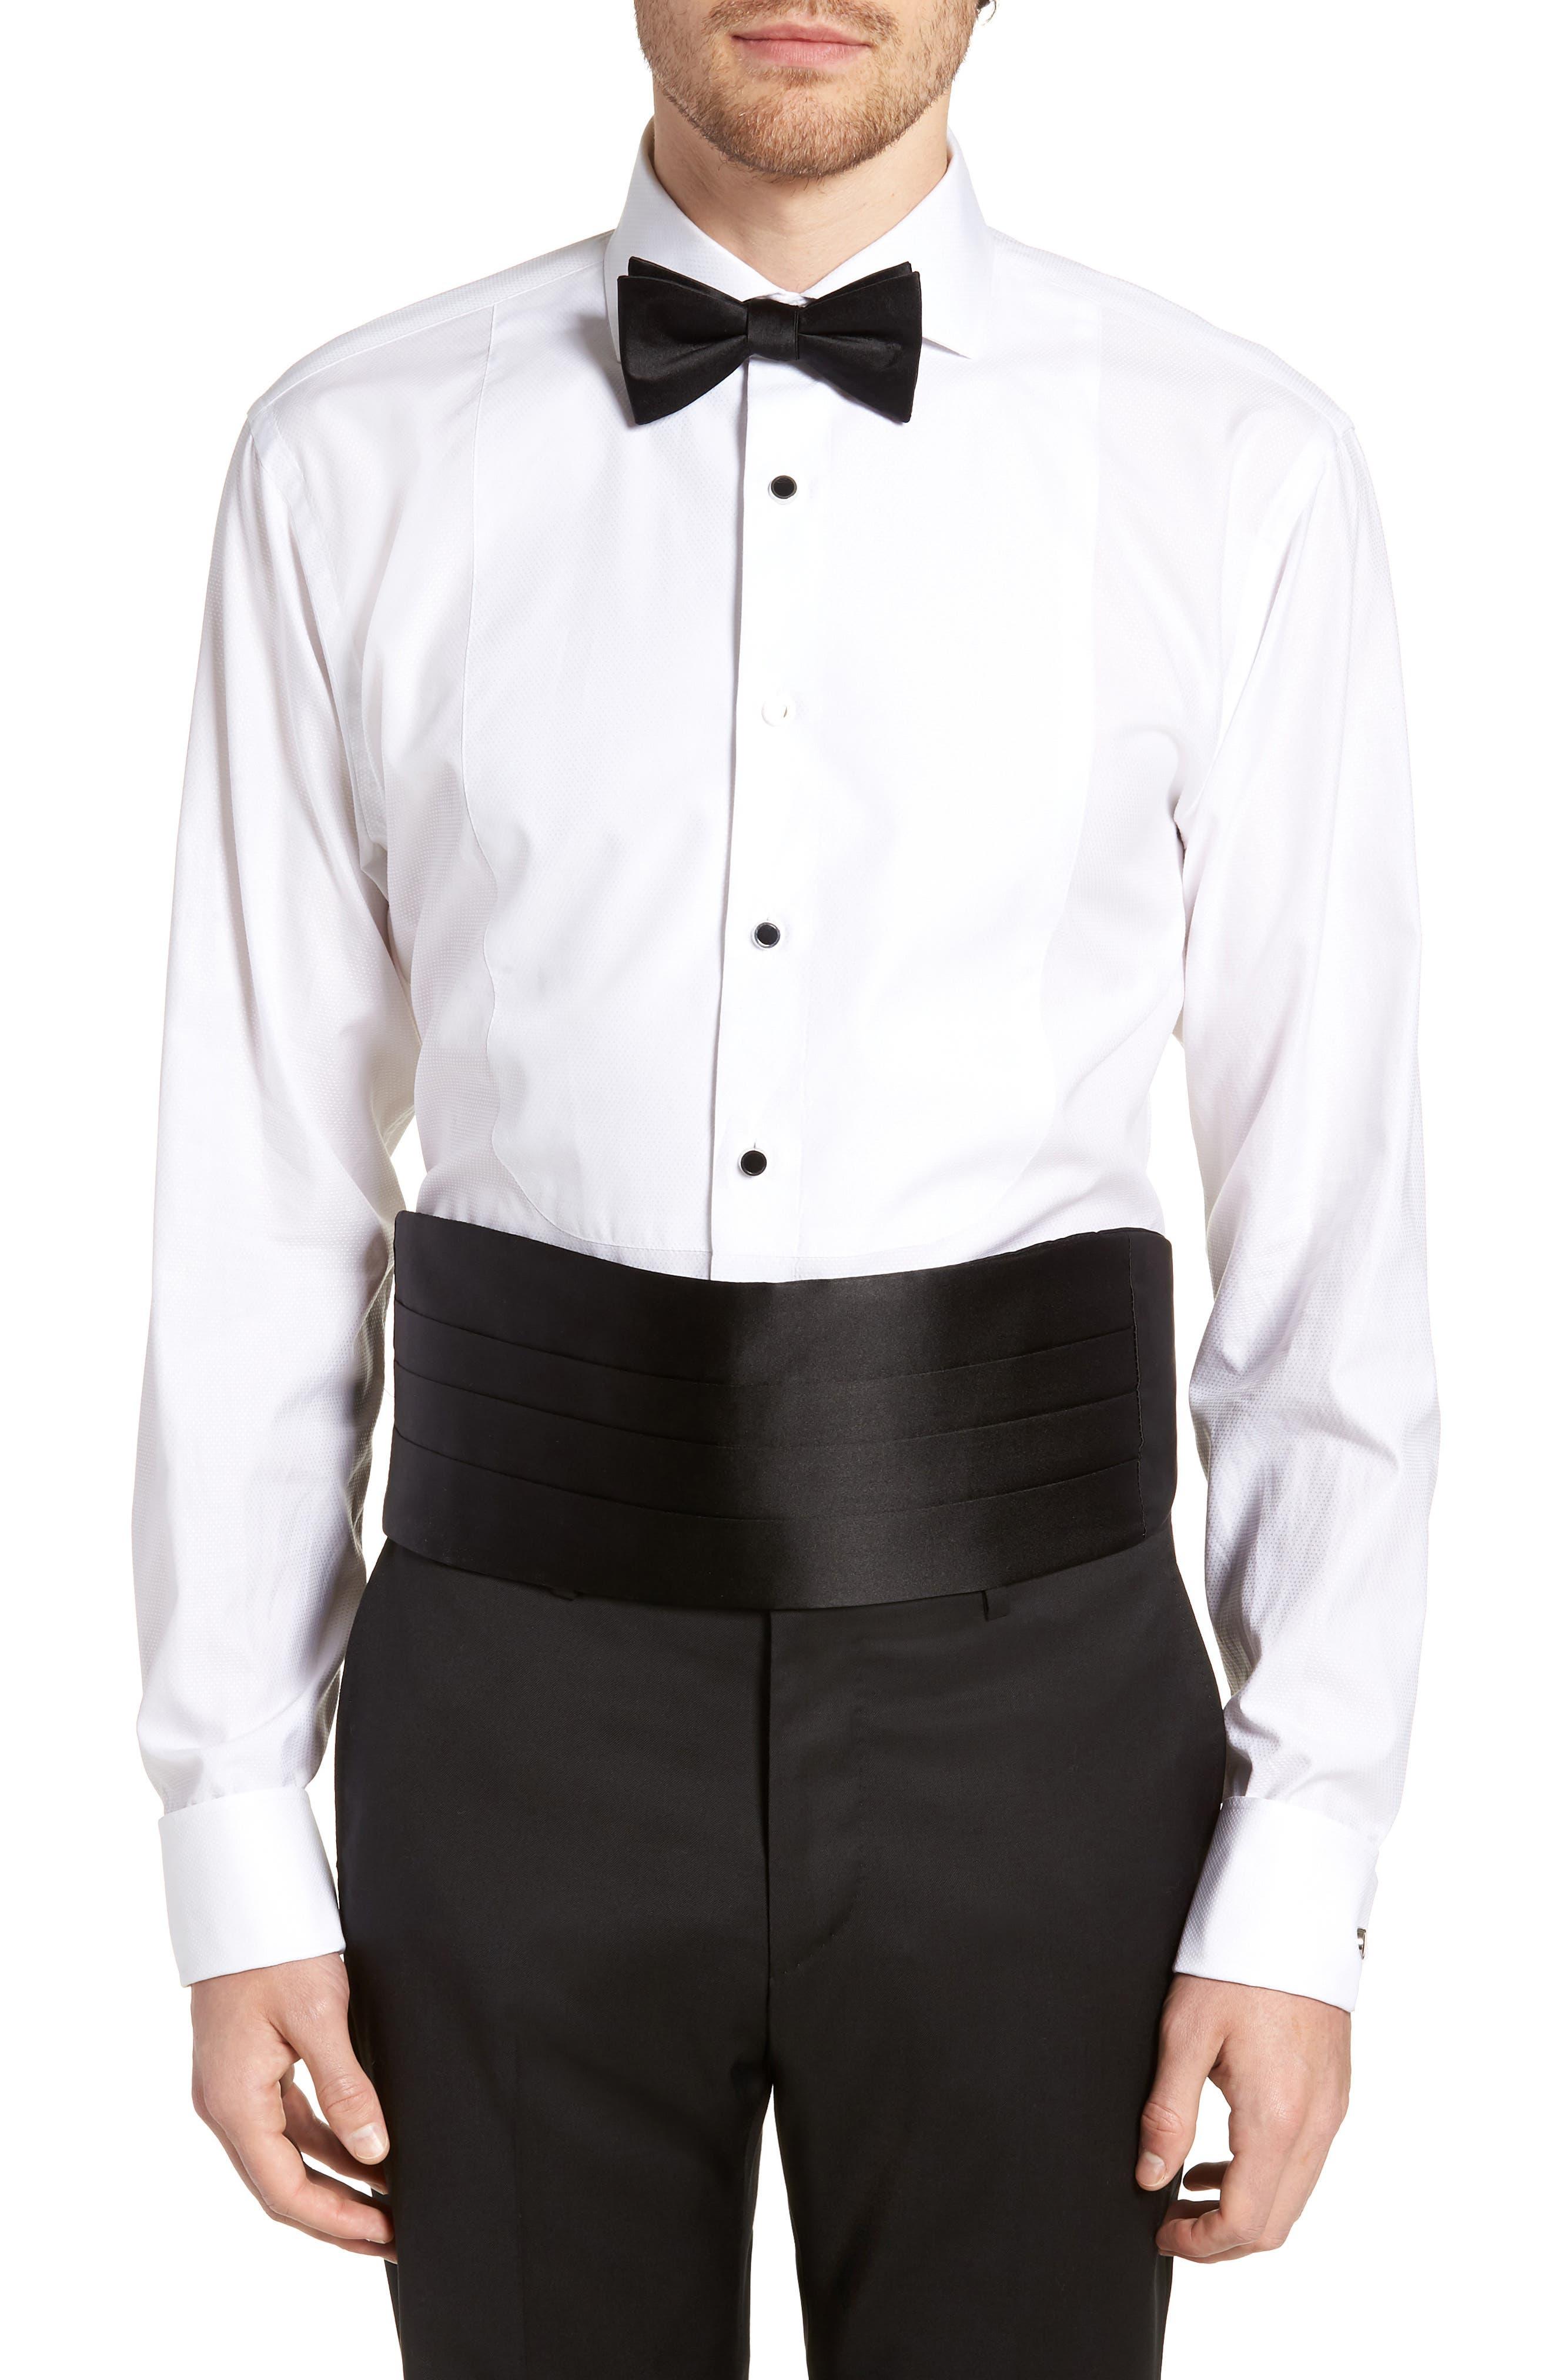 Silk Cummerbund & Pre-Tied Bow Tie Set,                             Main thumbnail 1, color,                             Black